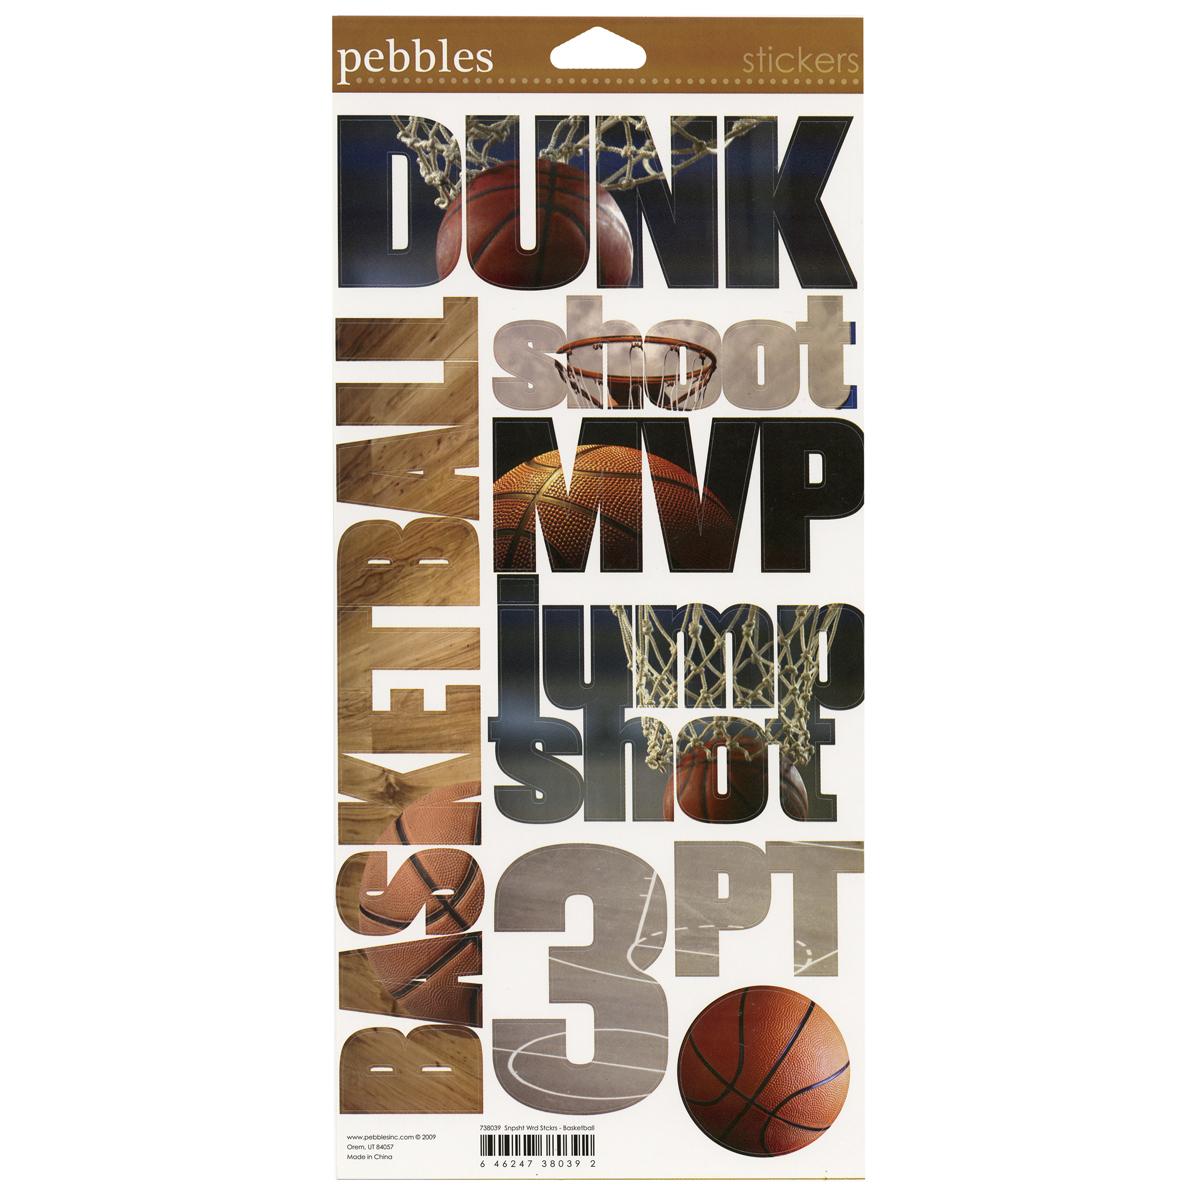 Basketball Words Sticker